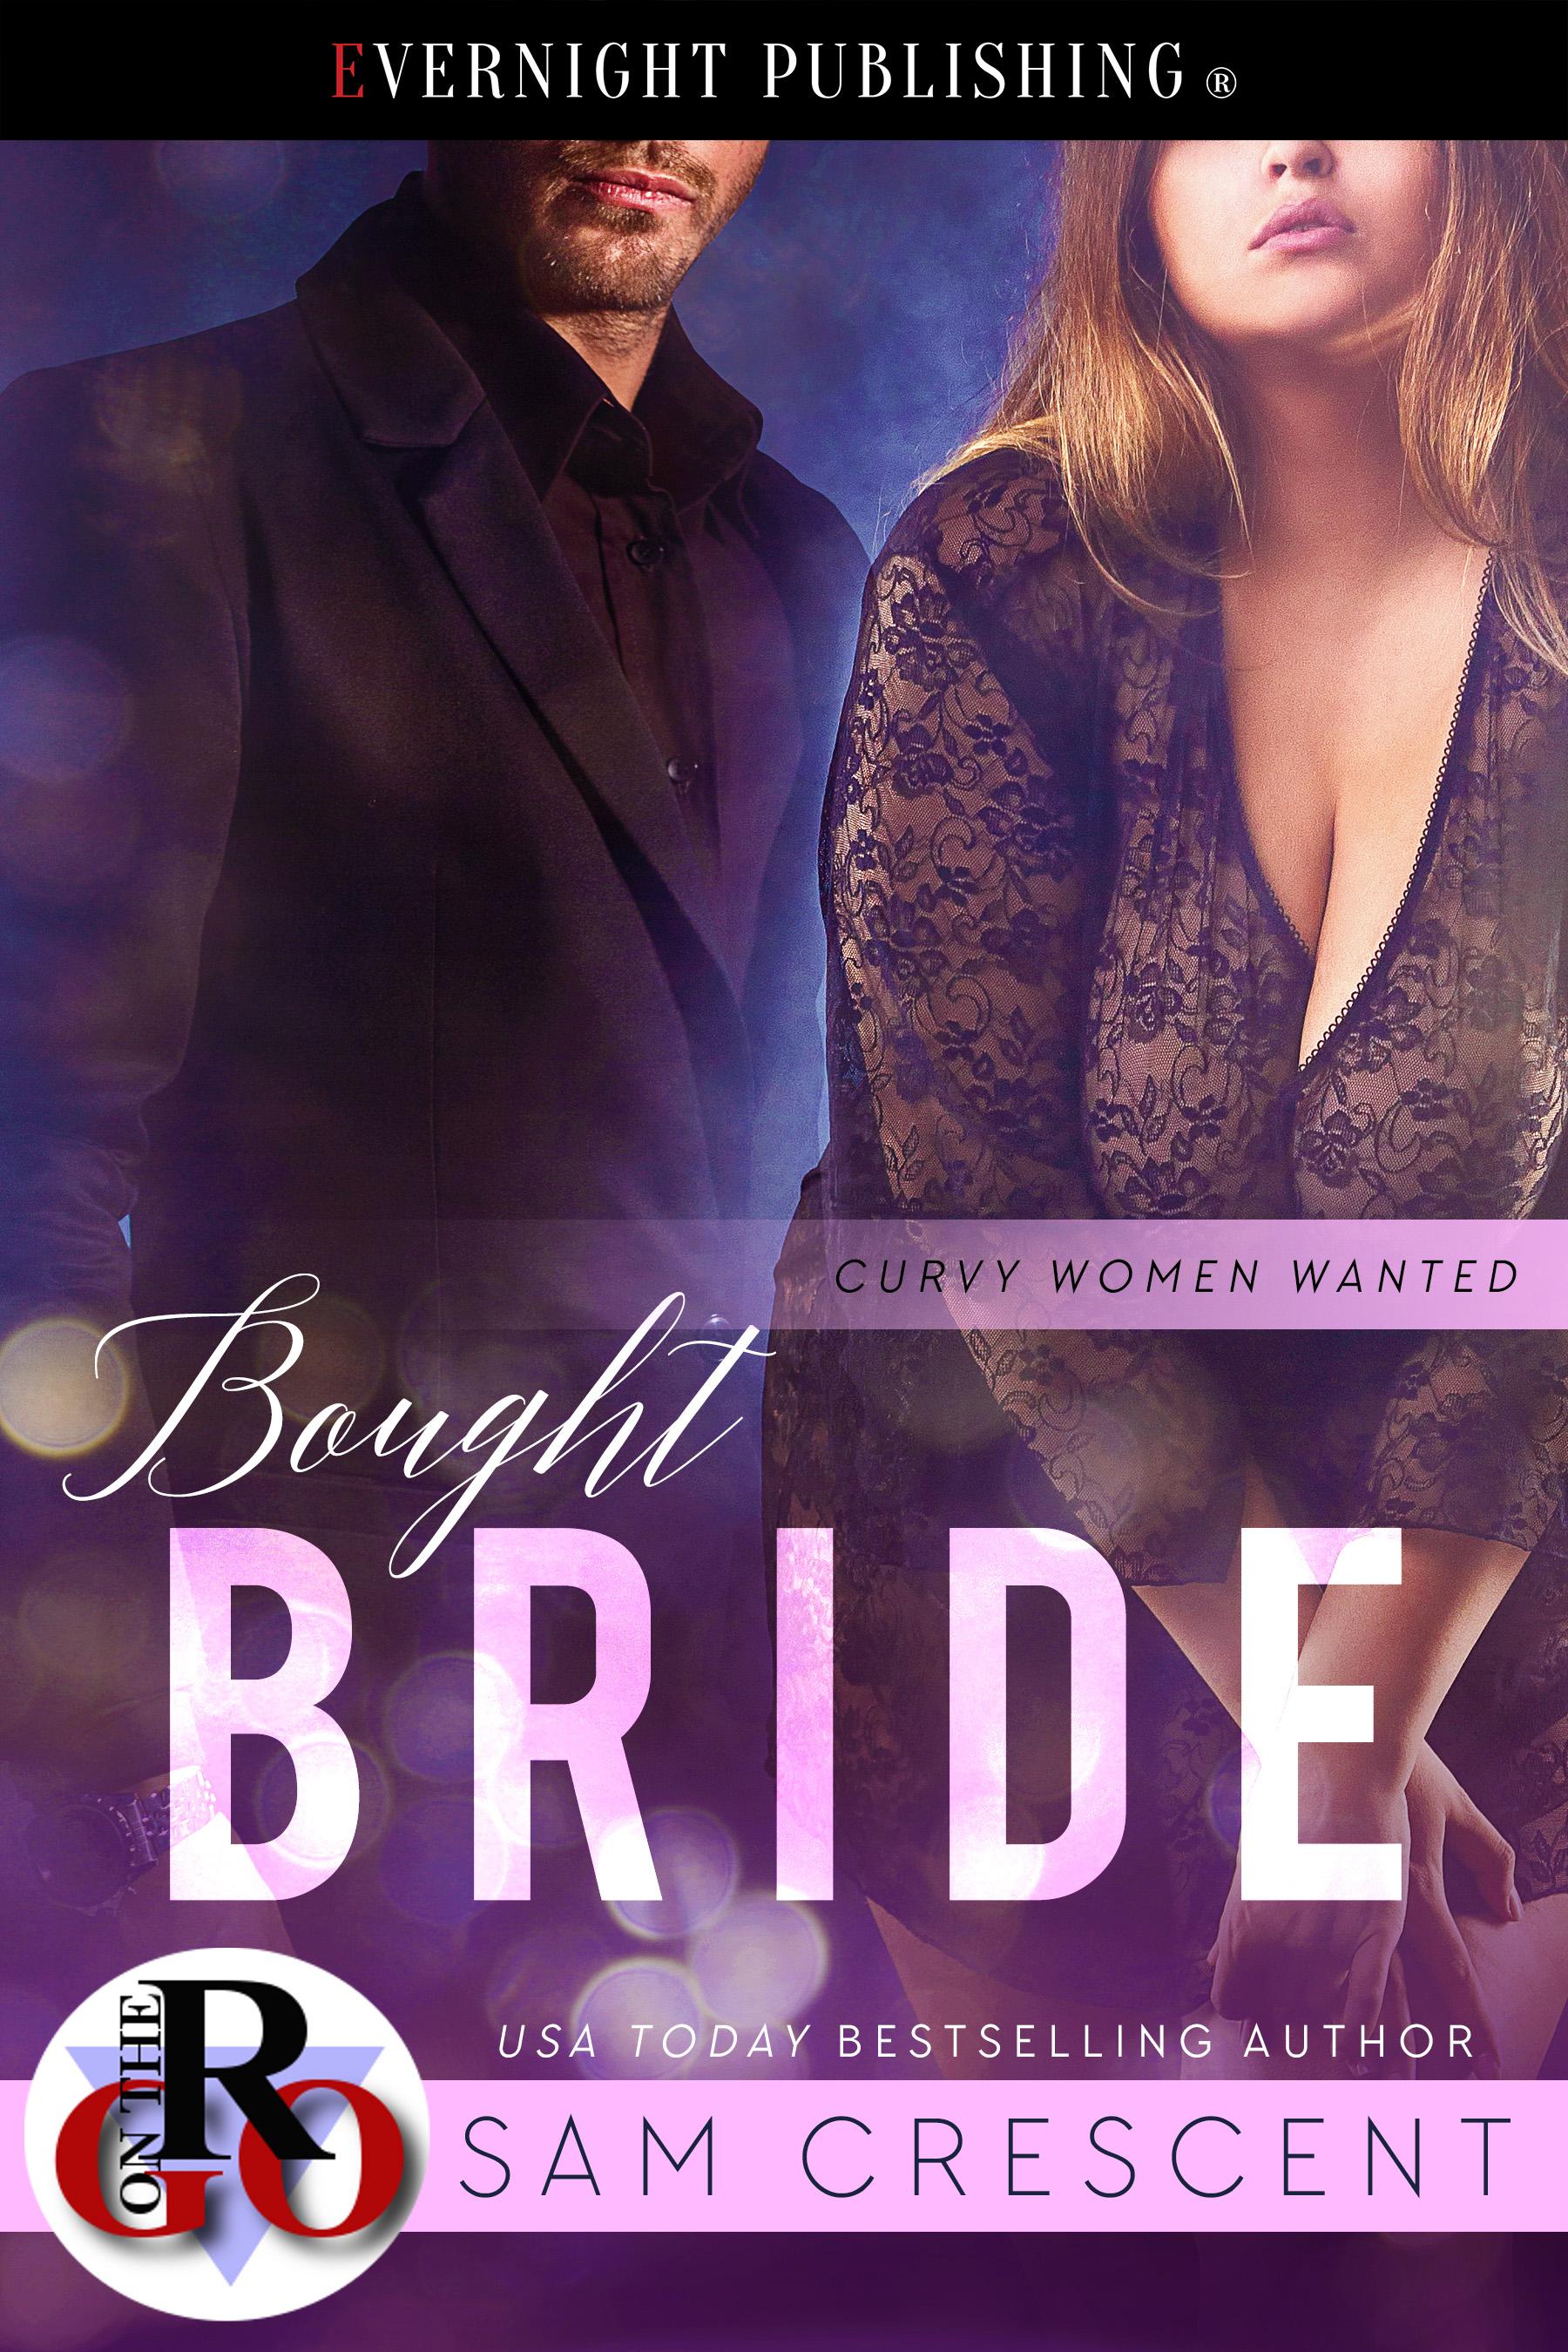 Bought-Bride-evernightpublishing-NOV2017